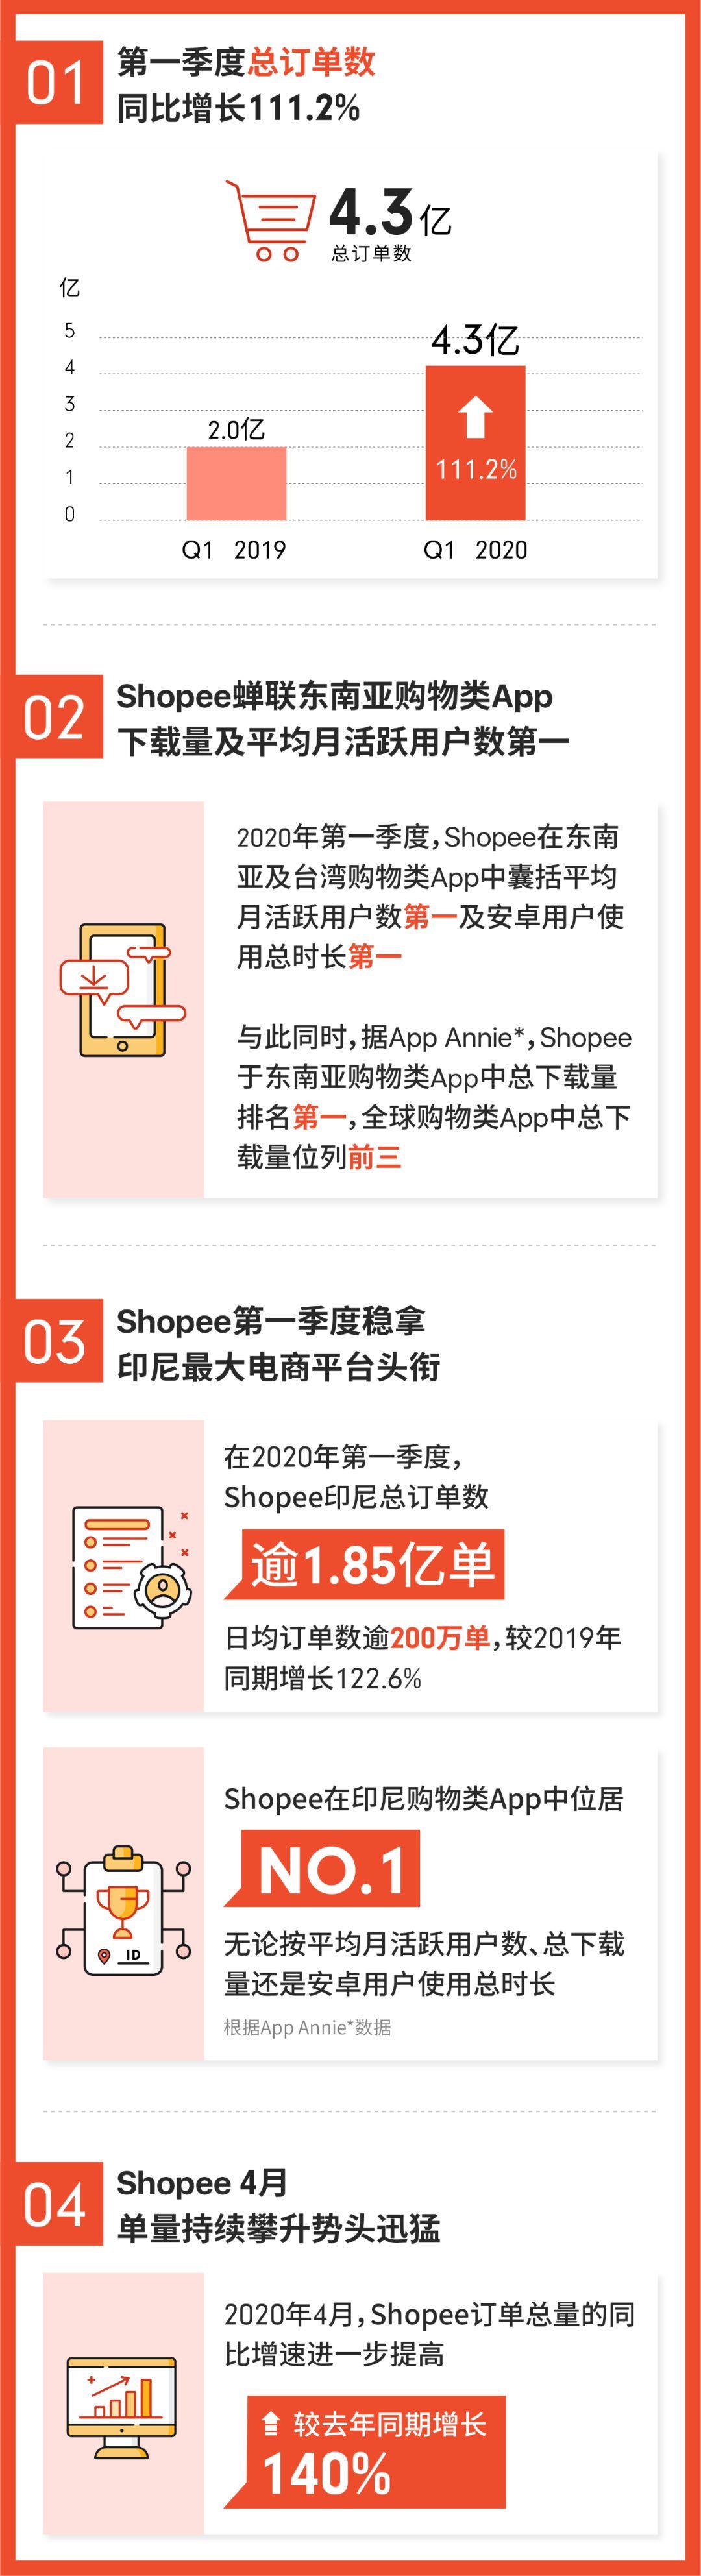 Shopee一季度订单数达4.3亿 同比增111.2%_跨境电商_电商报